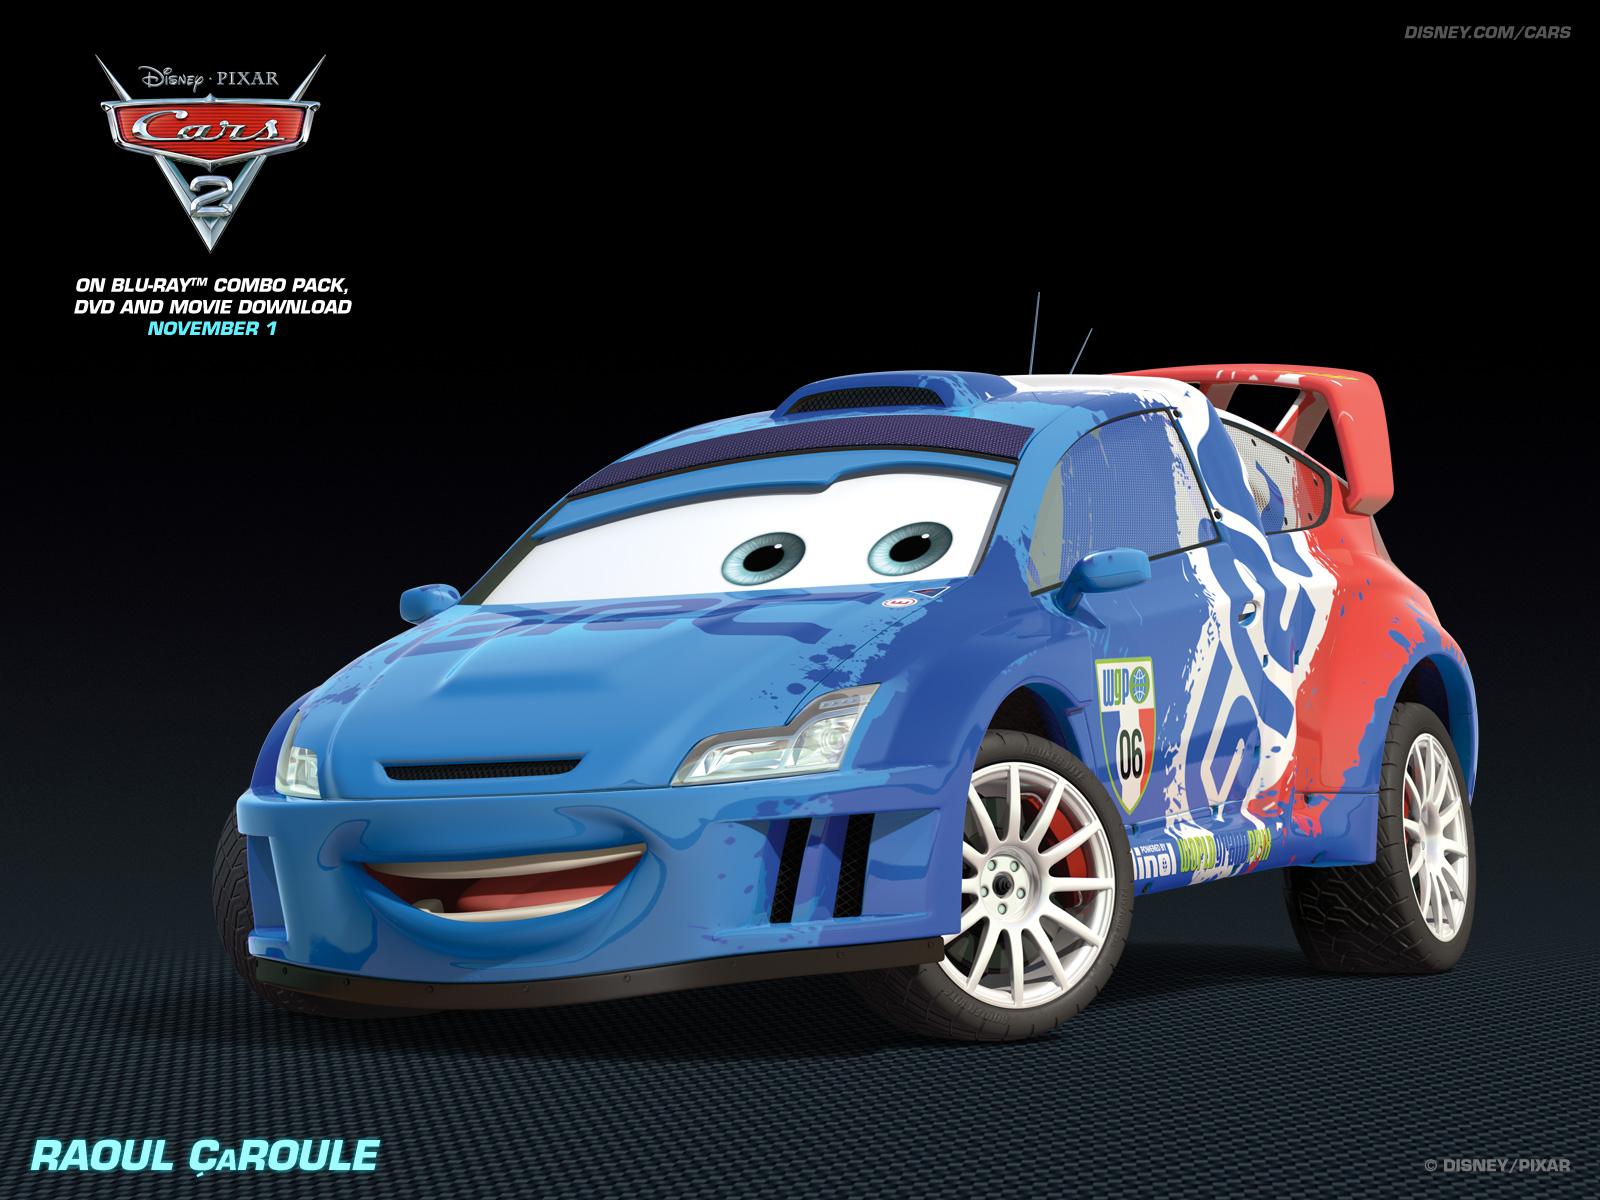 Raoul CaRoule   Disney Pixar Cars 2 Wallpaper 28399918 1600x1200